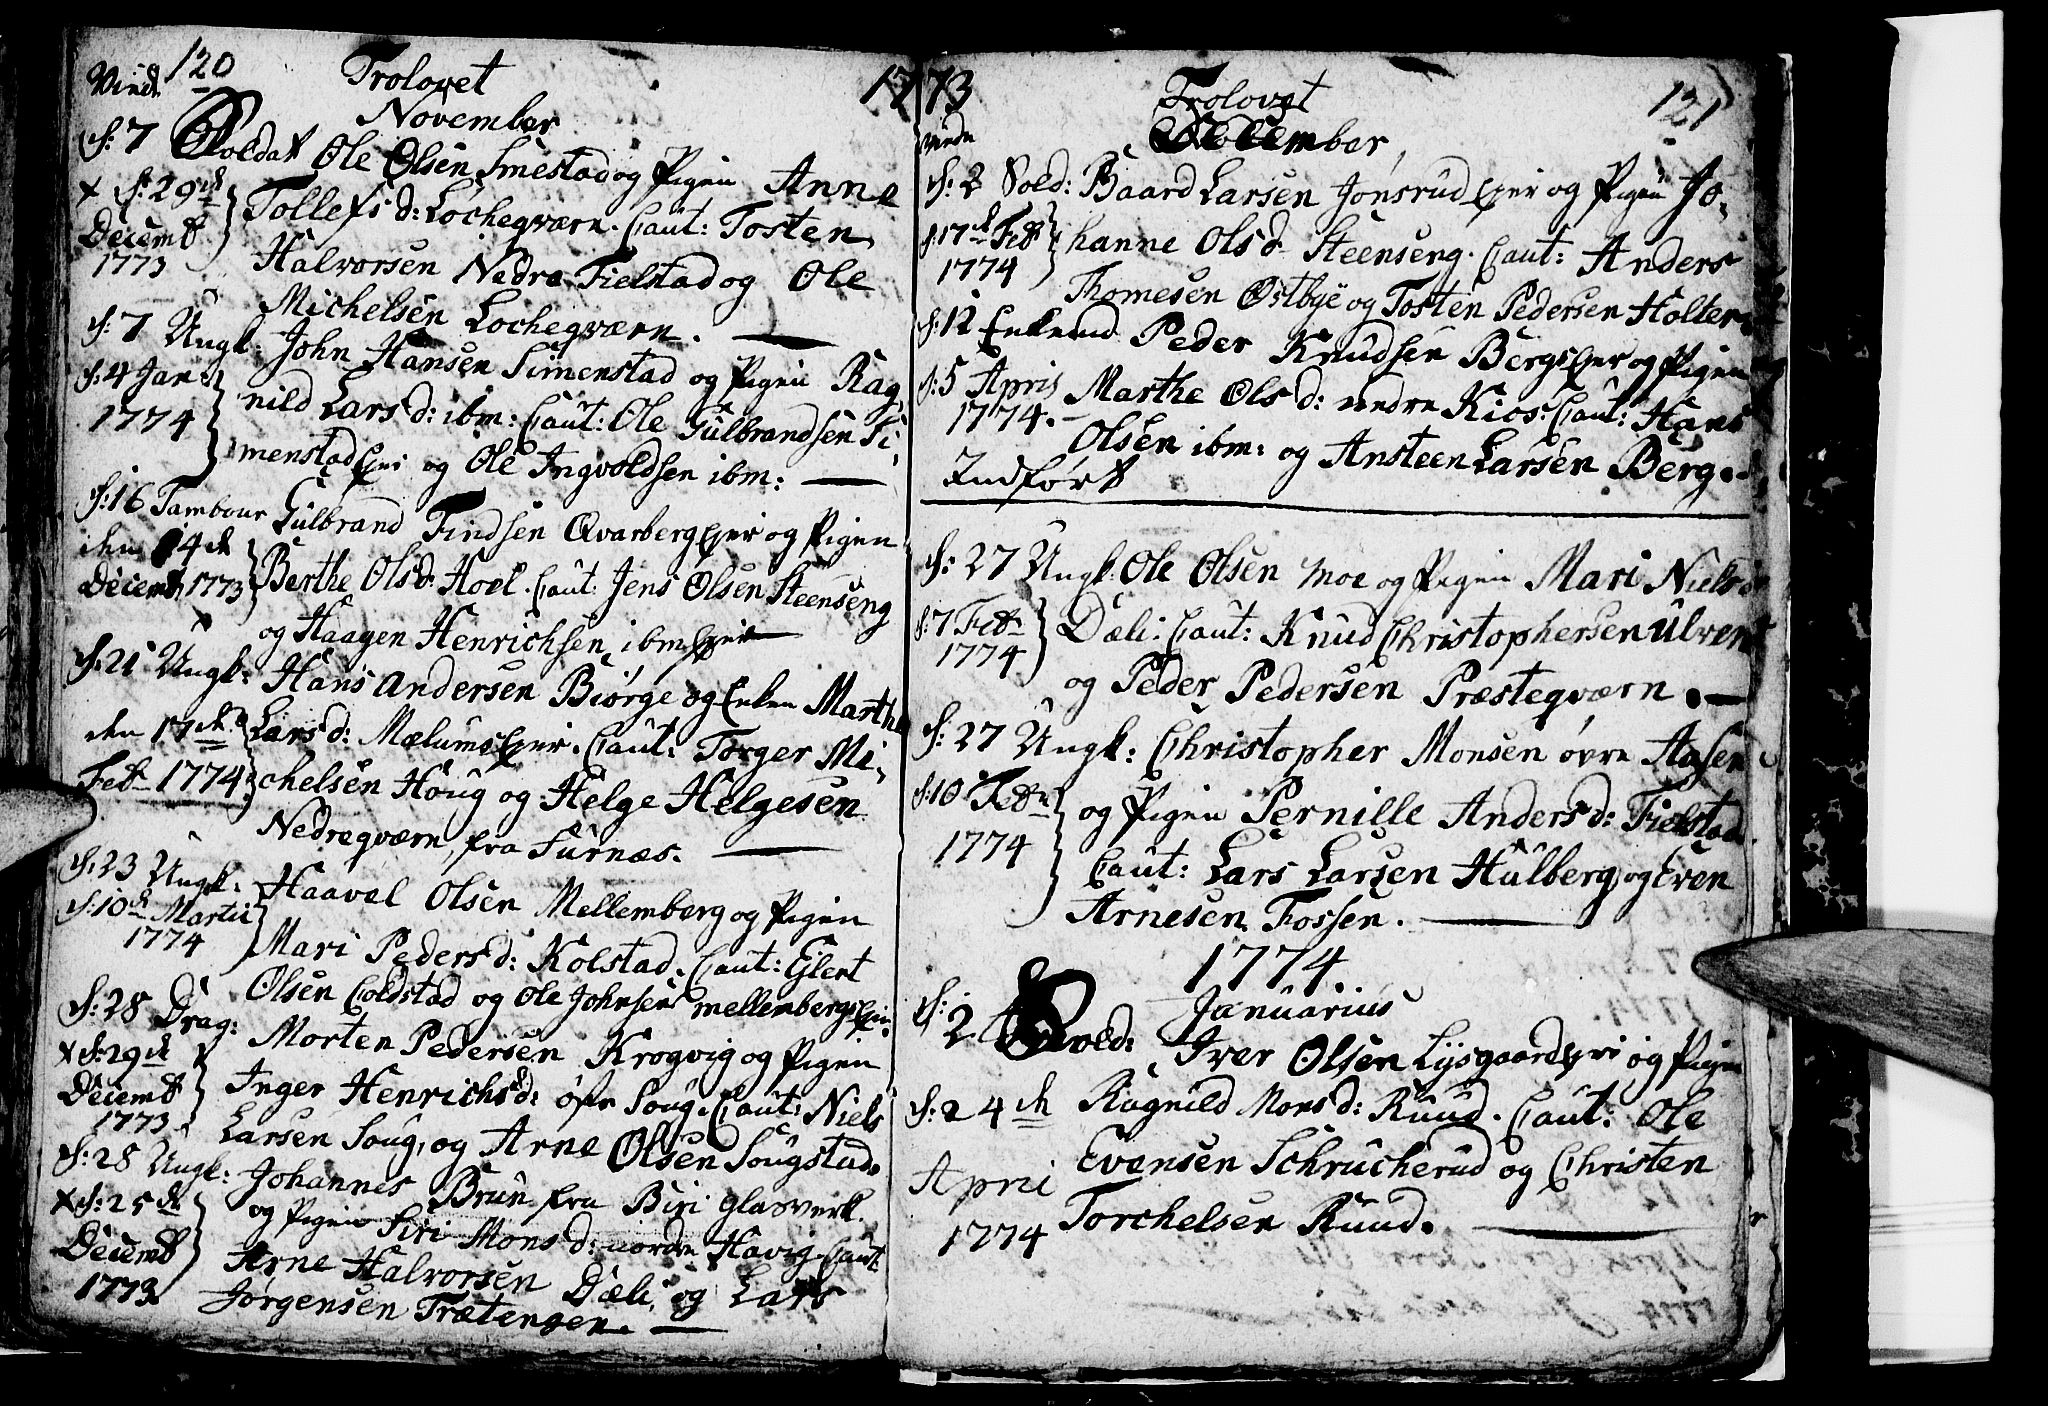 SAH, Ringsaker prestekontor, I/Ia/L0005/0001: Kladd til kirkebok nr. 1A, 1773-1775, s. 120-121